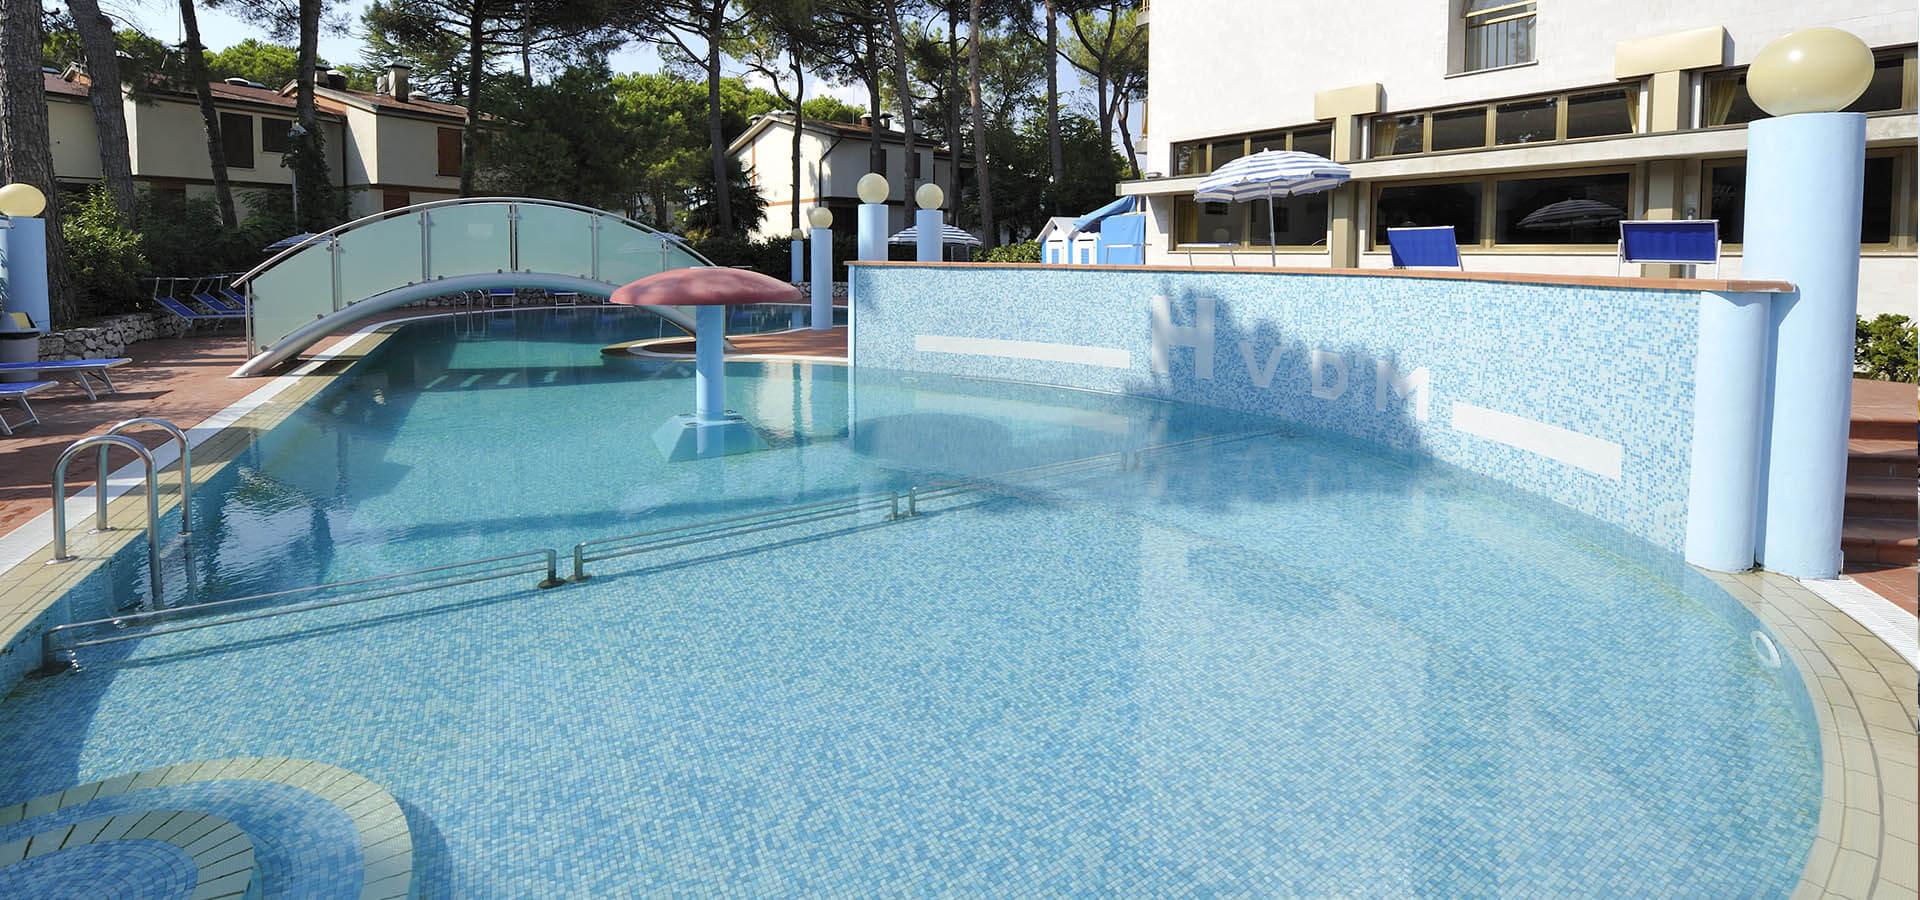 Acqua Azzurra Piscine piscina: hotel viña de mar